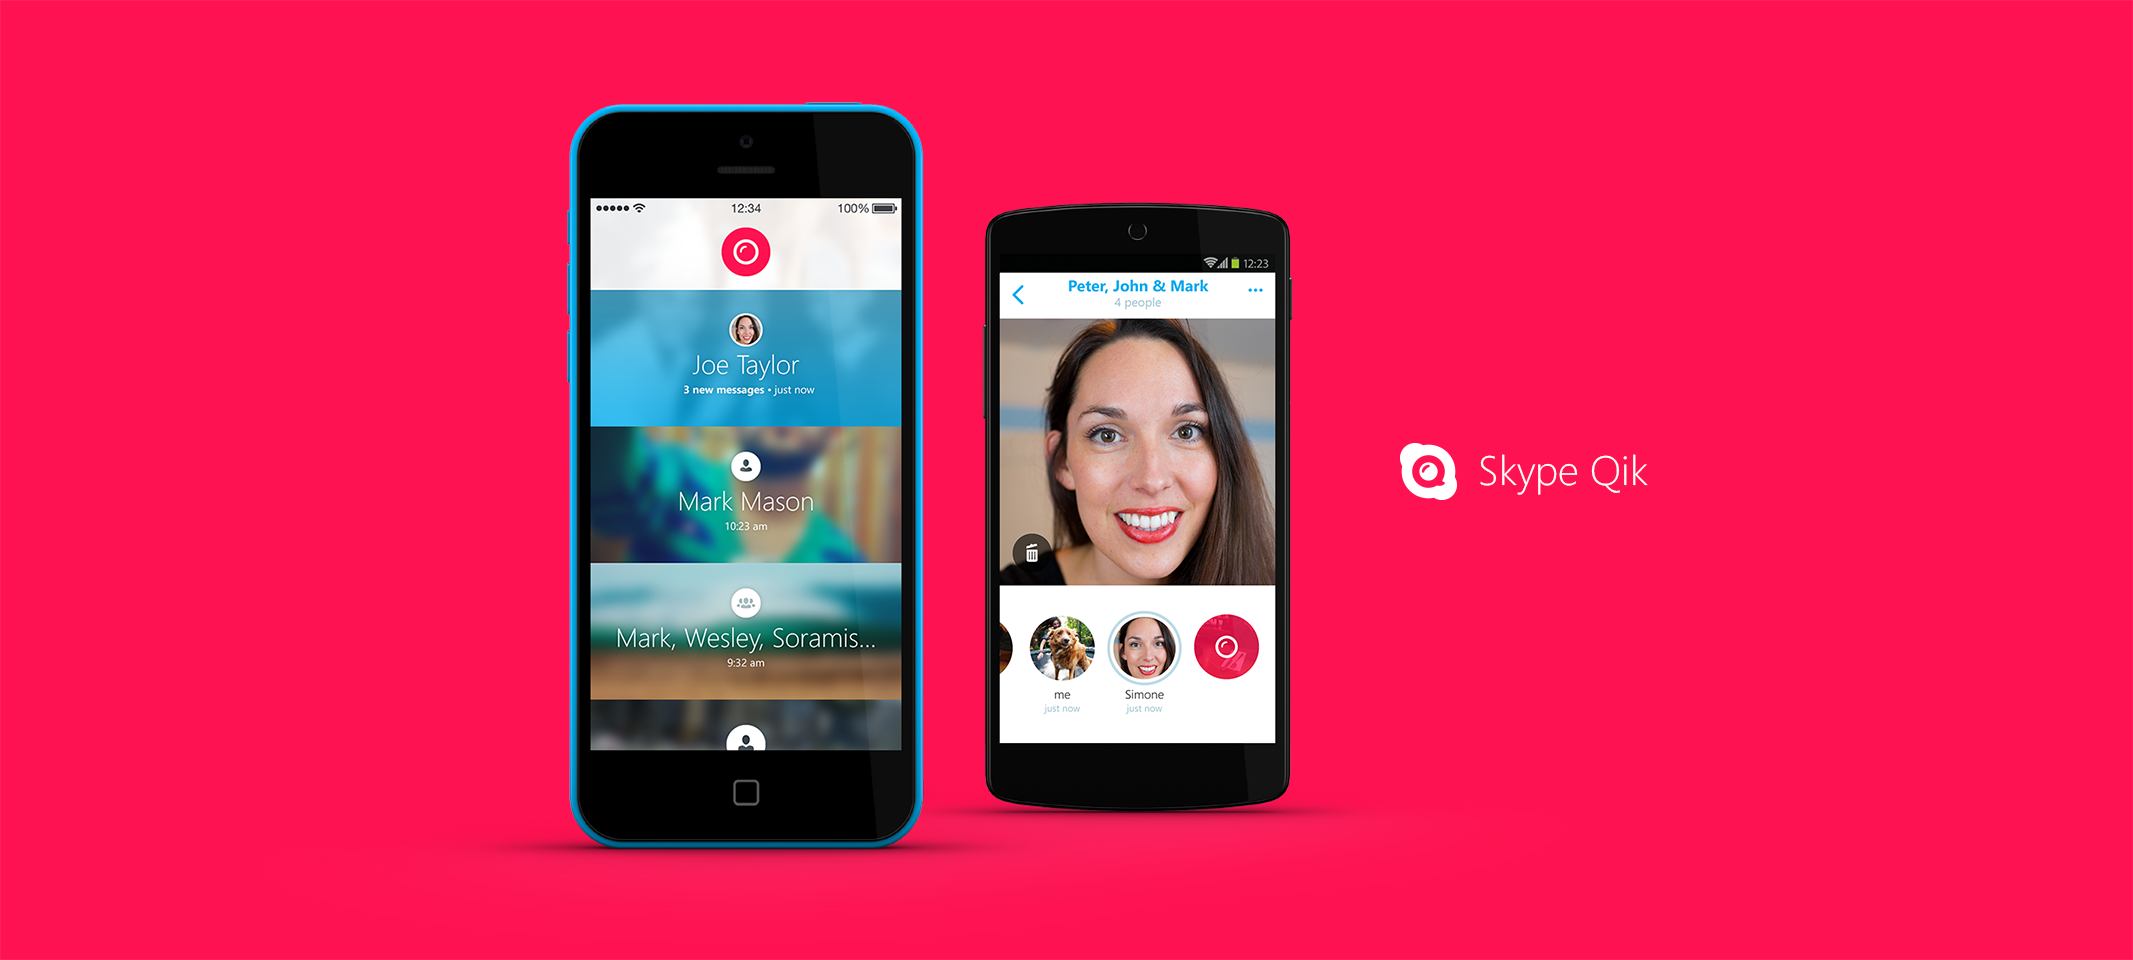 Skype-Qik.png